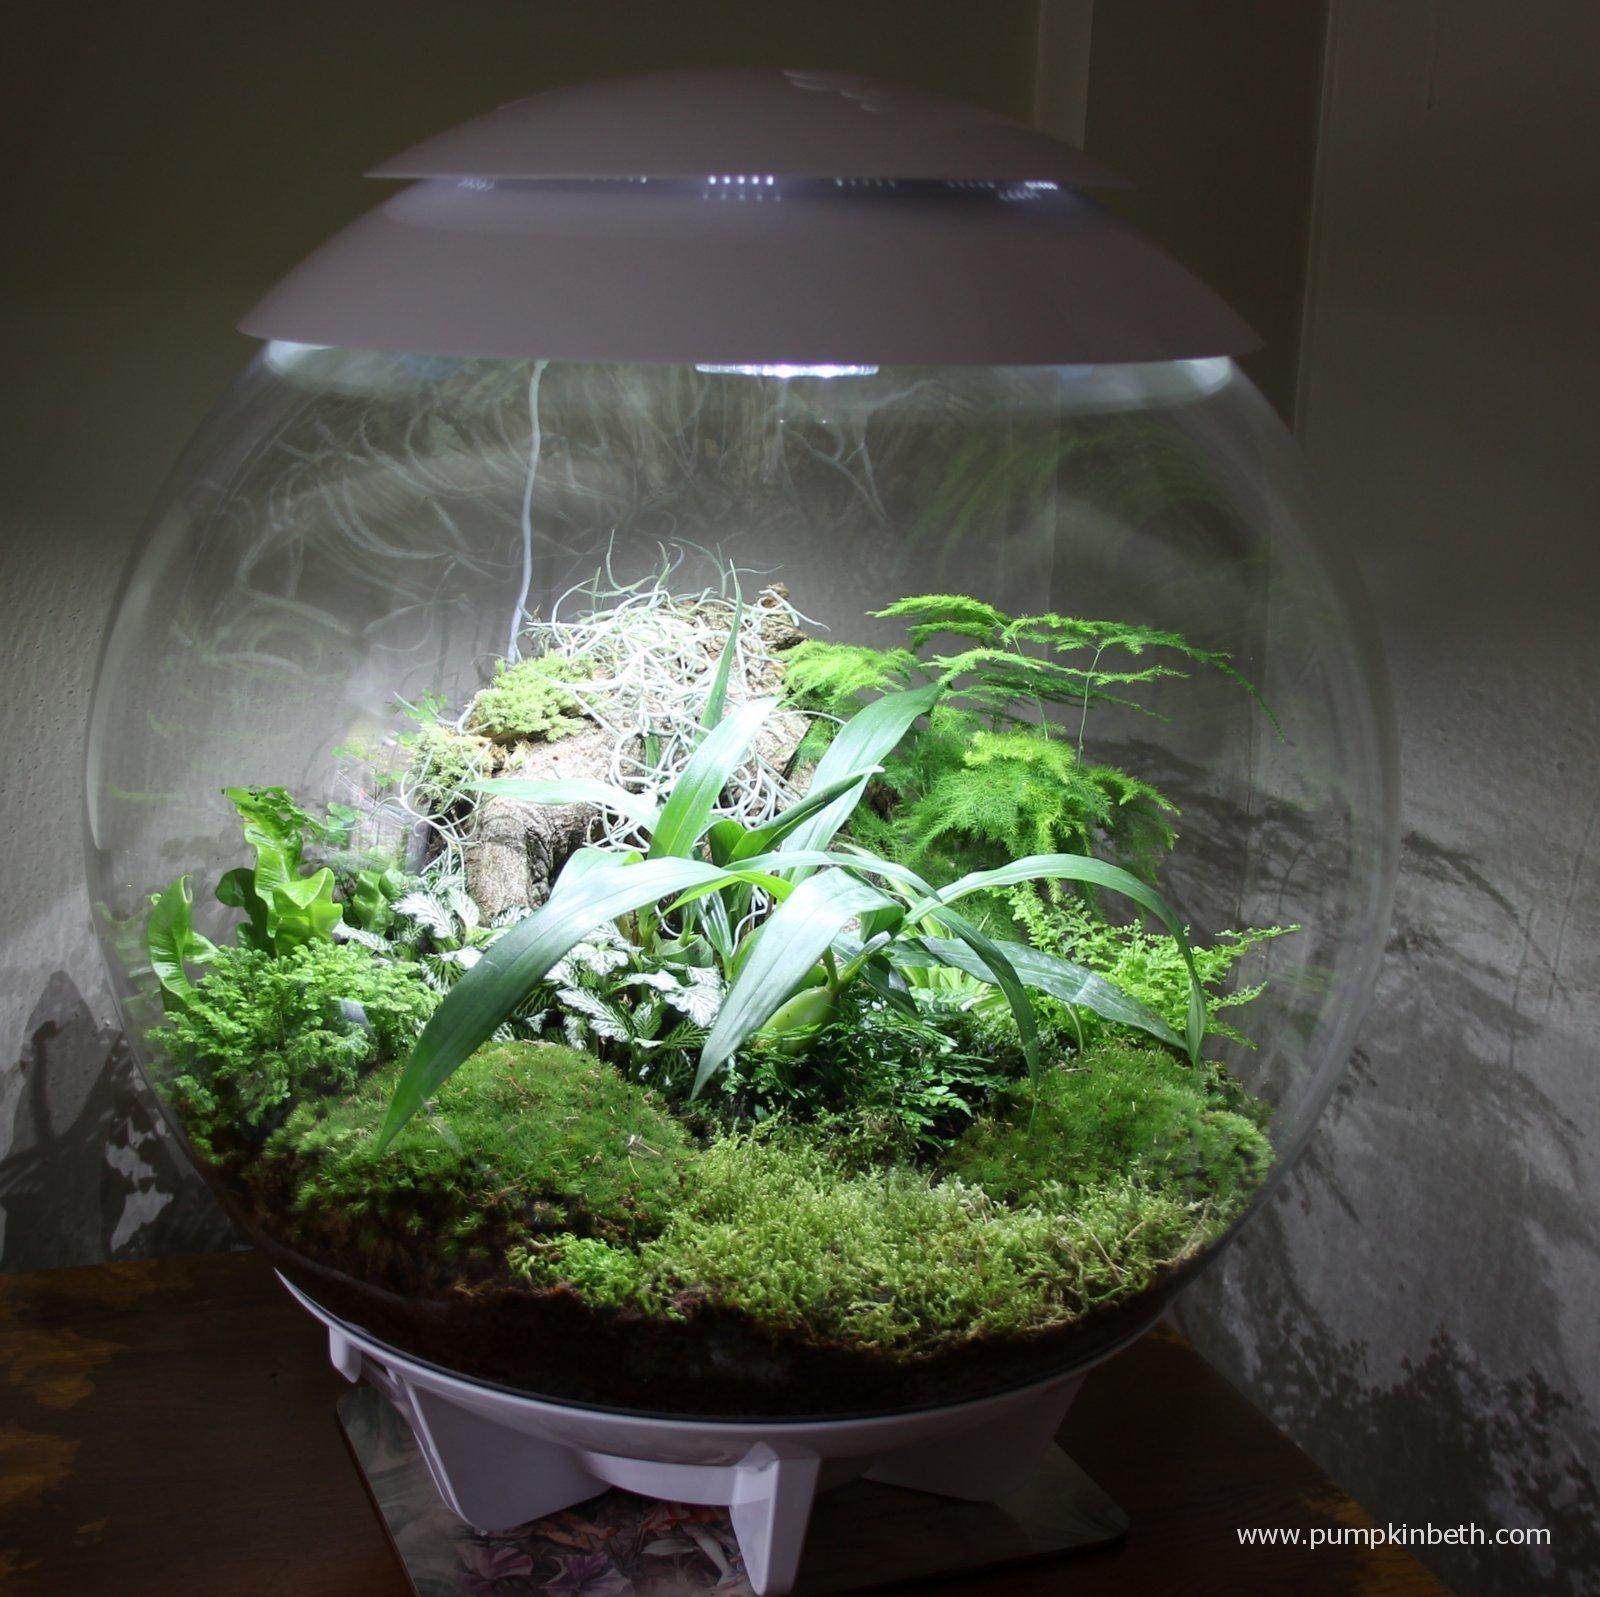 Indoor Gardening - Magazine cover